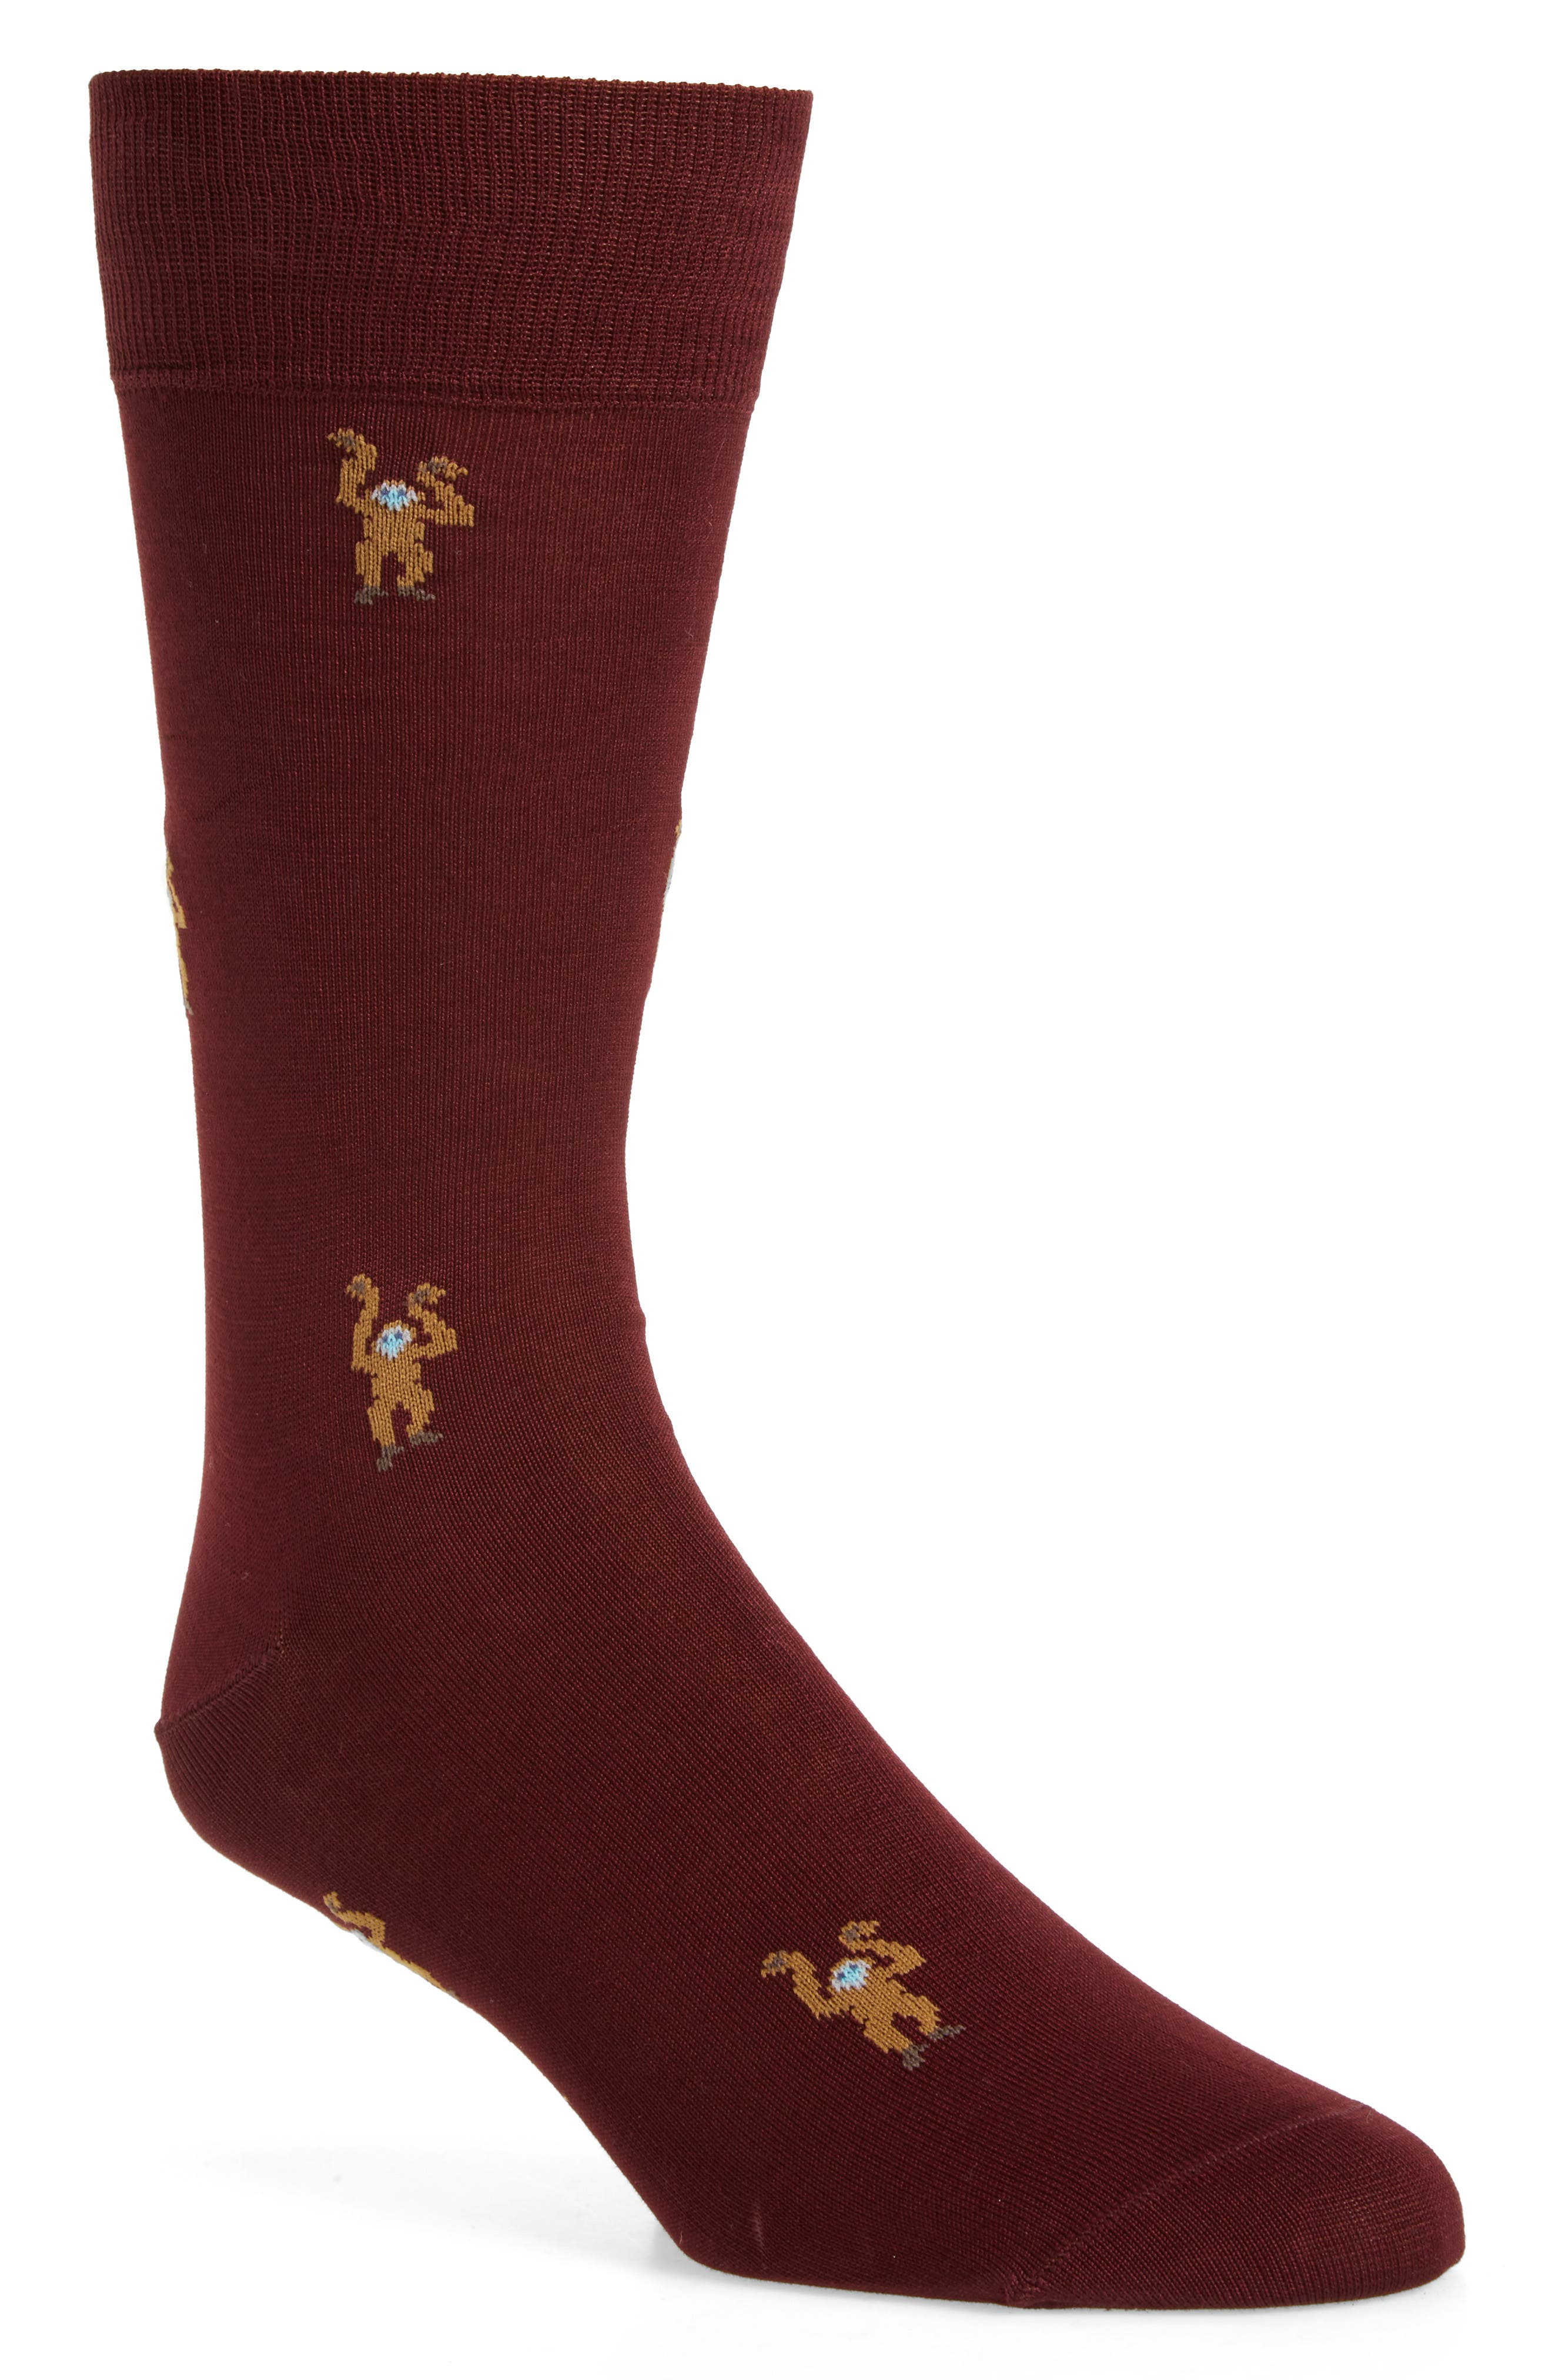 Monkey Socks,                         Main,                         color, Burgundy